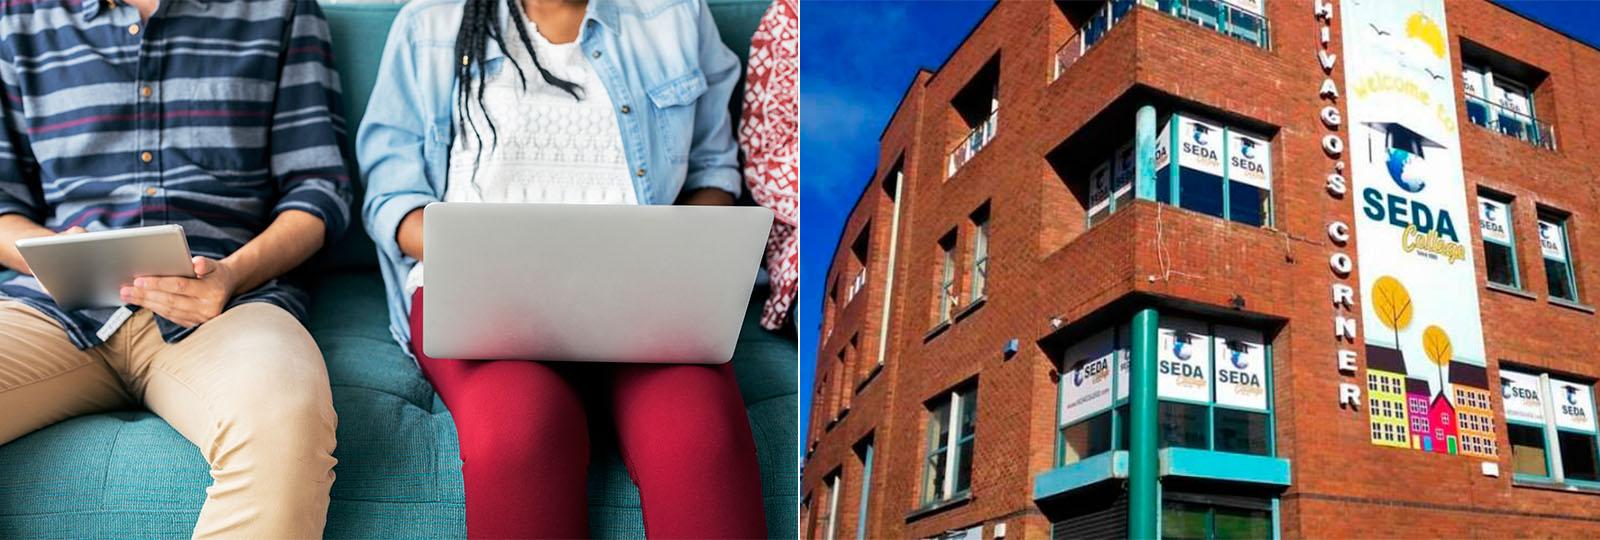 Escola irlandesa tem 15 cursos online gratuitos